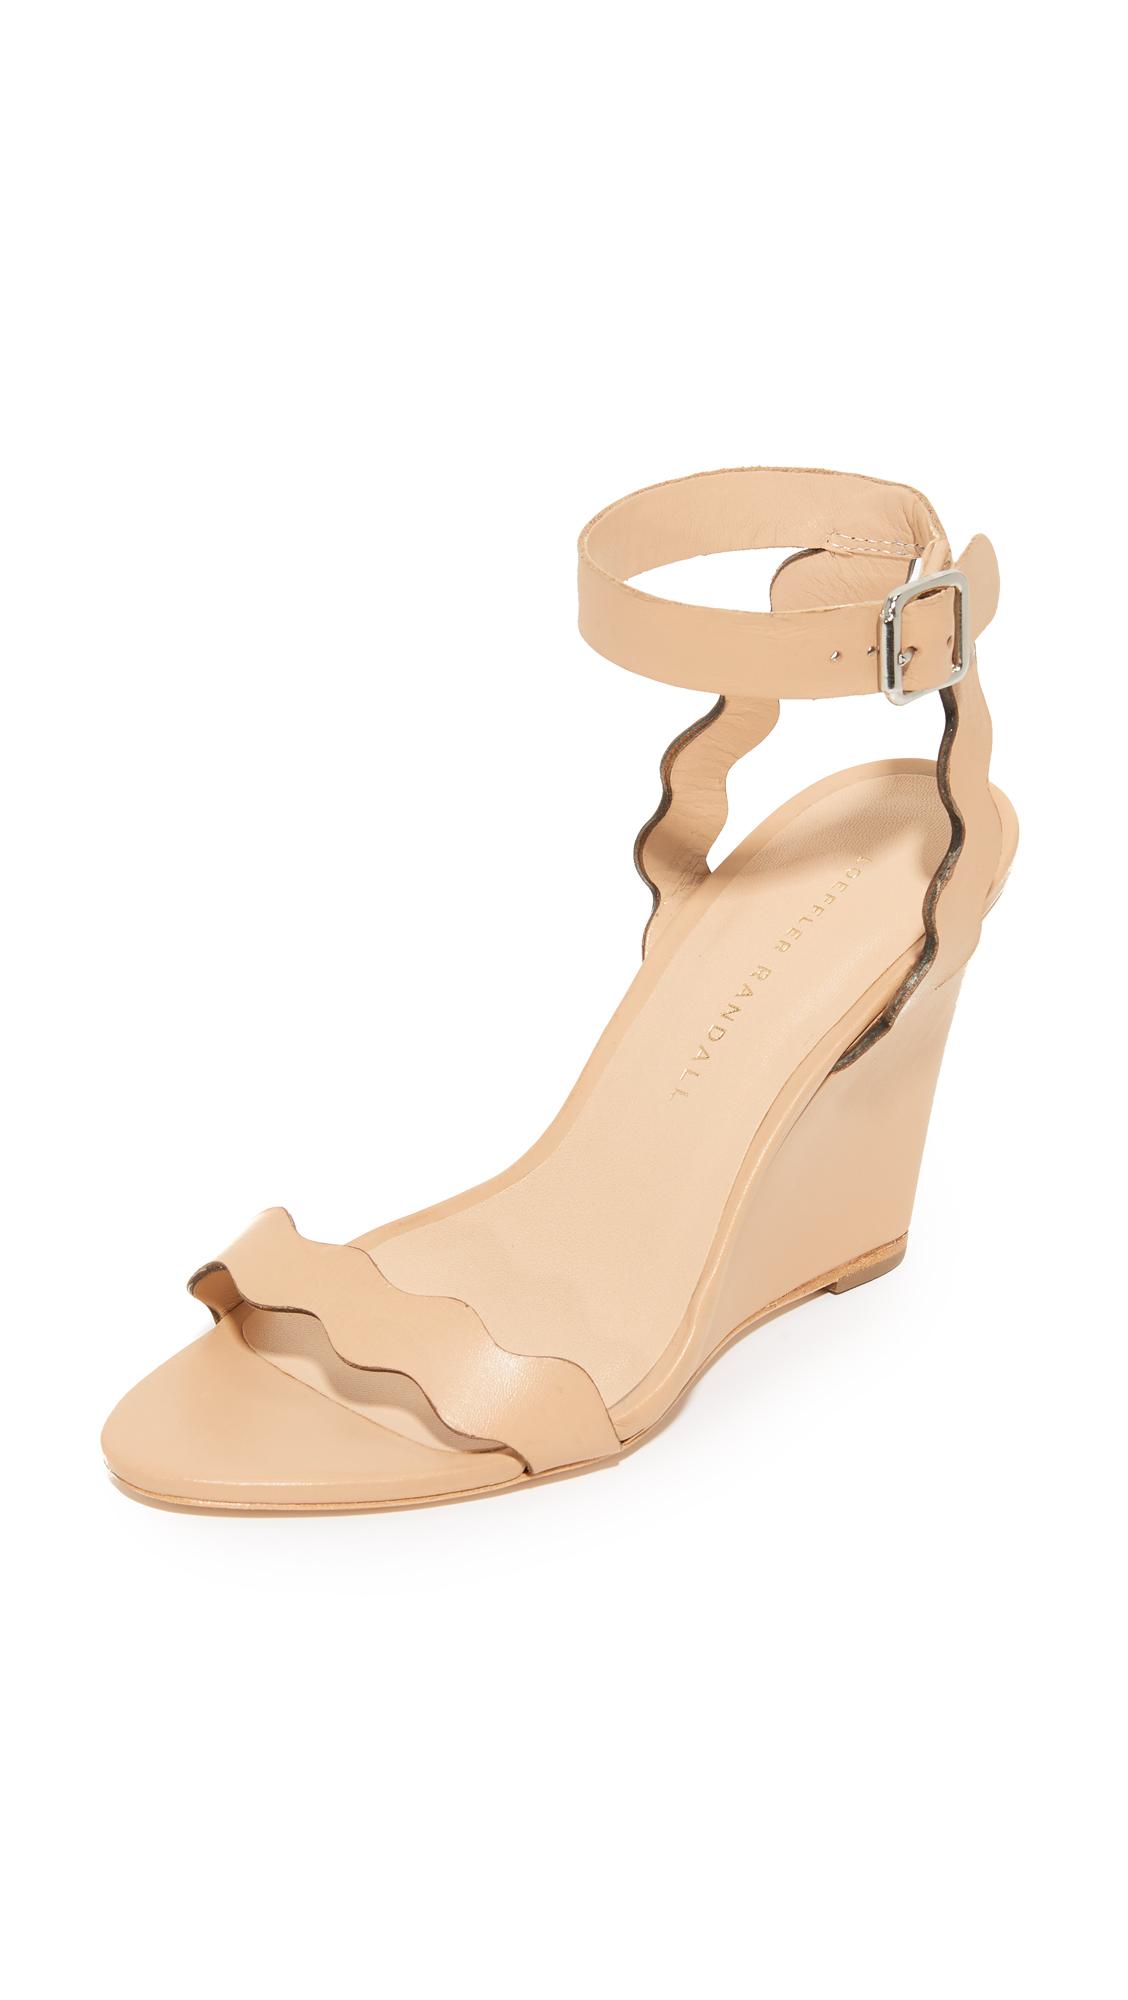 Loeffler Randall Piper Wedge Sandals - Wheat